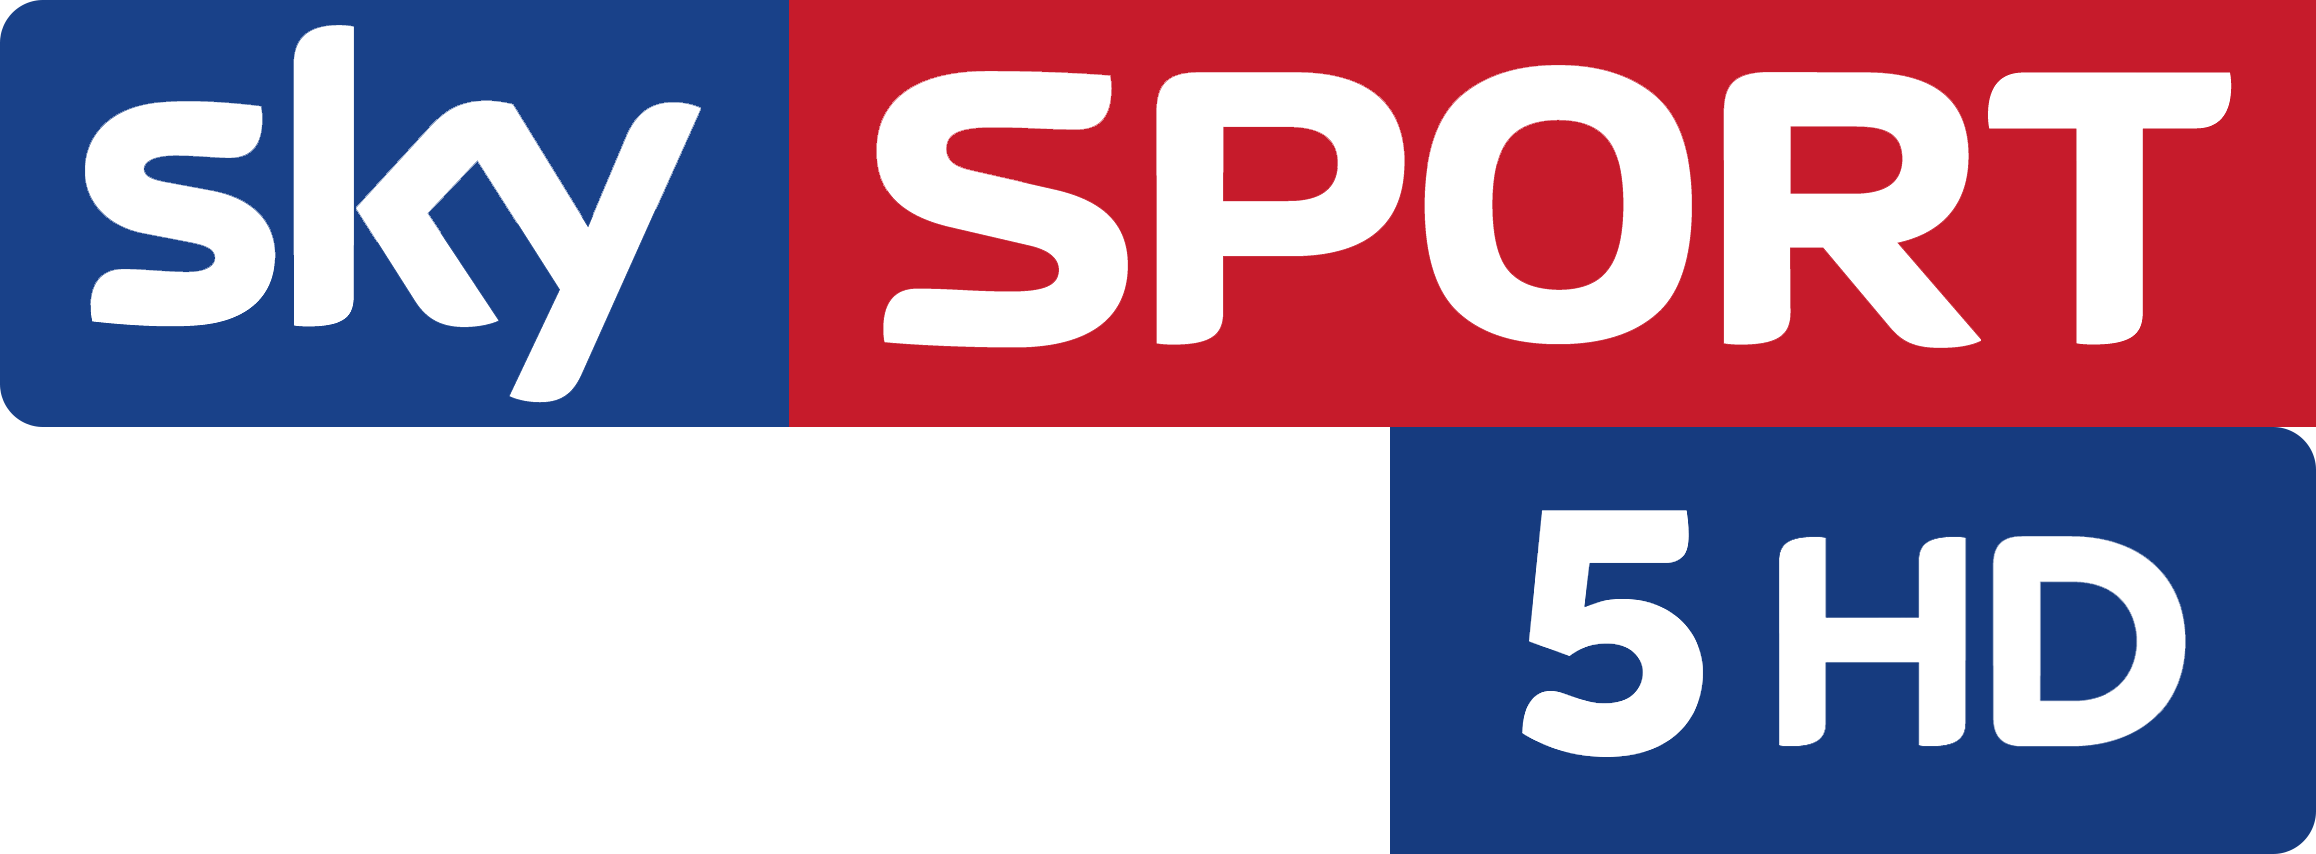 Sky Sport 5